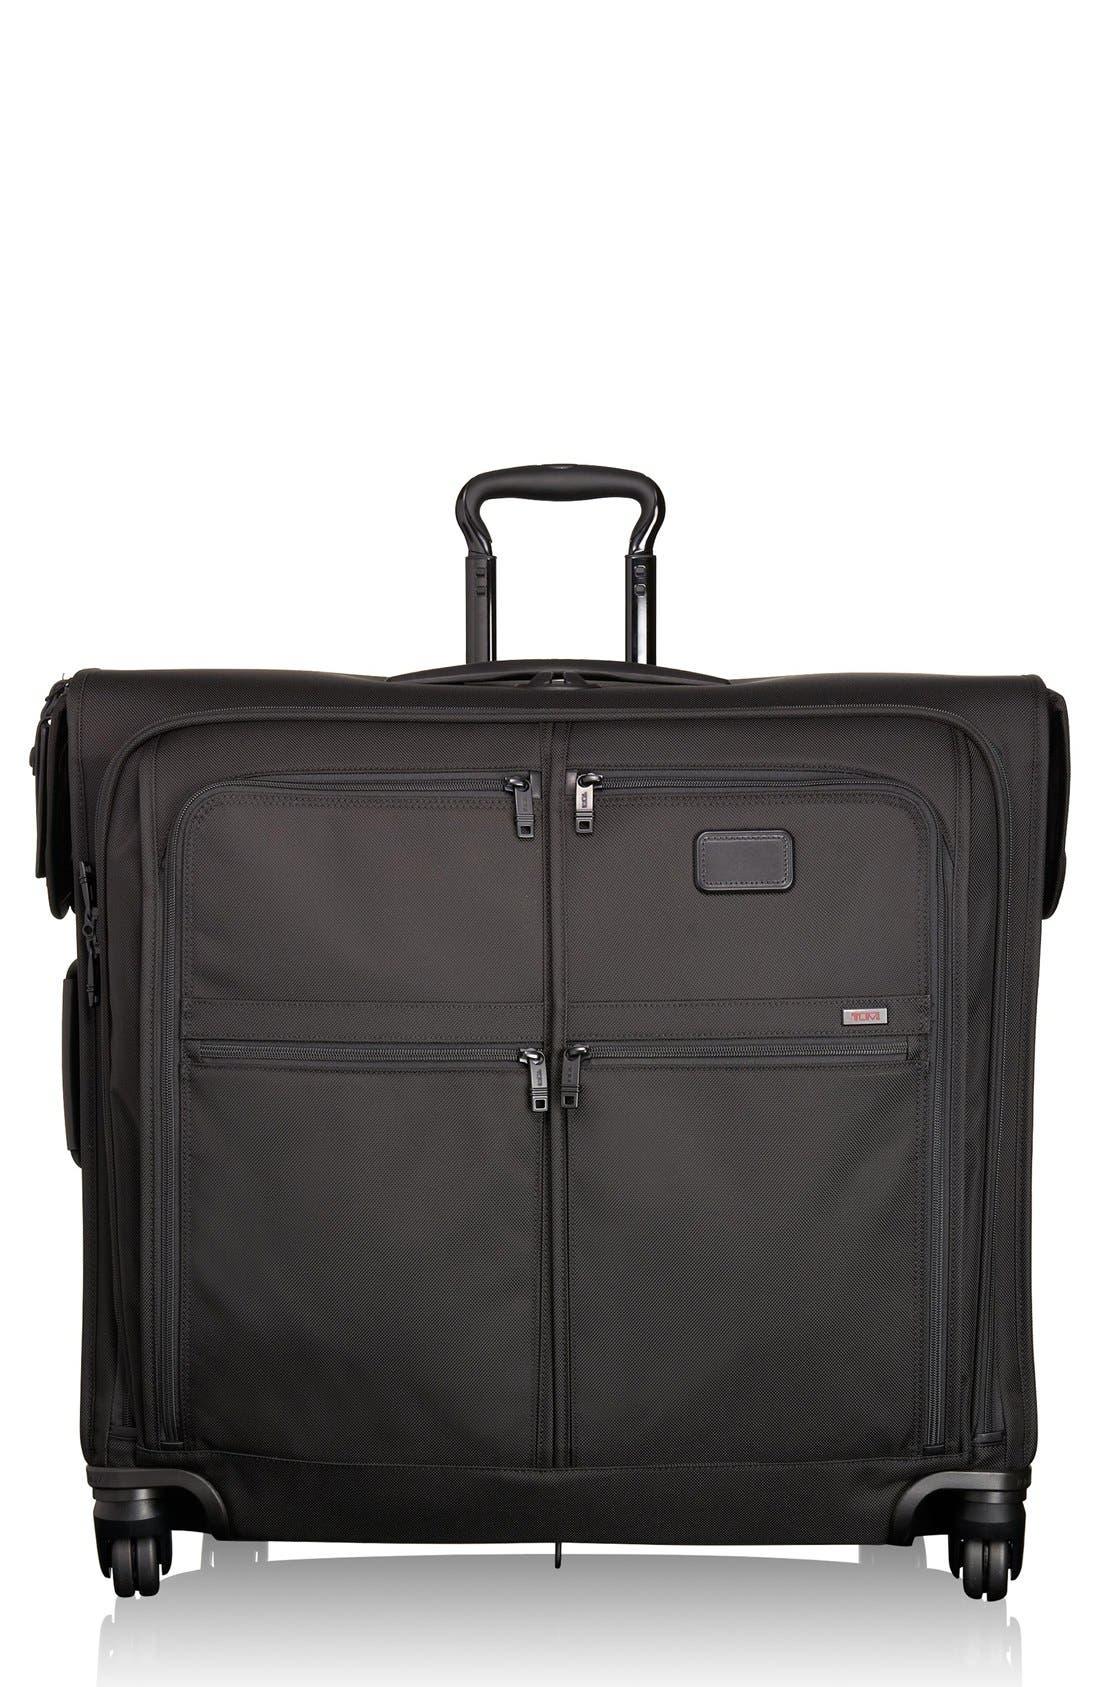 Alternate Image 1 Selected - Tumi Alpha 2 Extended Trip Wheeled Garment Bag